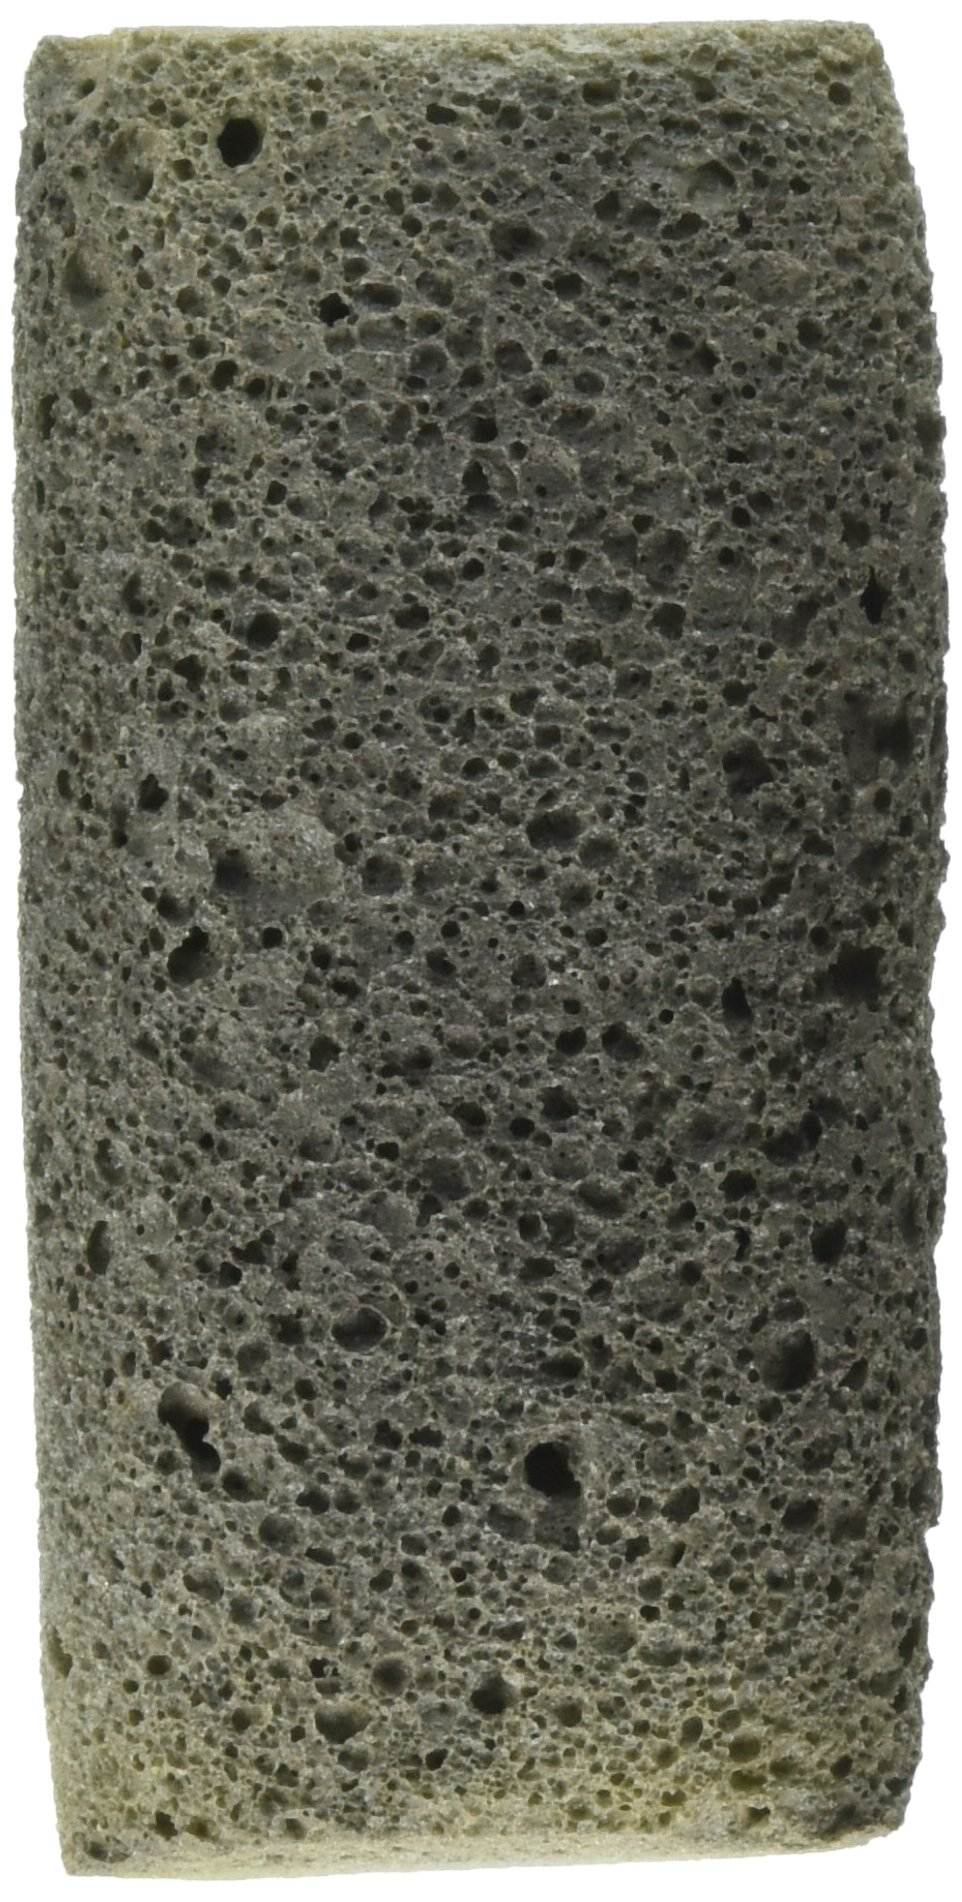 Groomer's Stone Pets Grooming Tool, Grey by Groomer's Stone